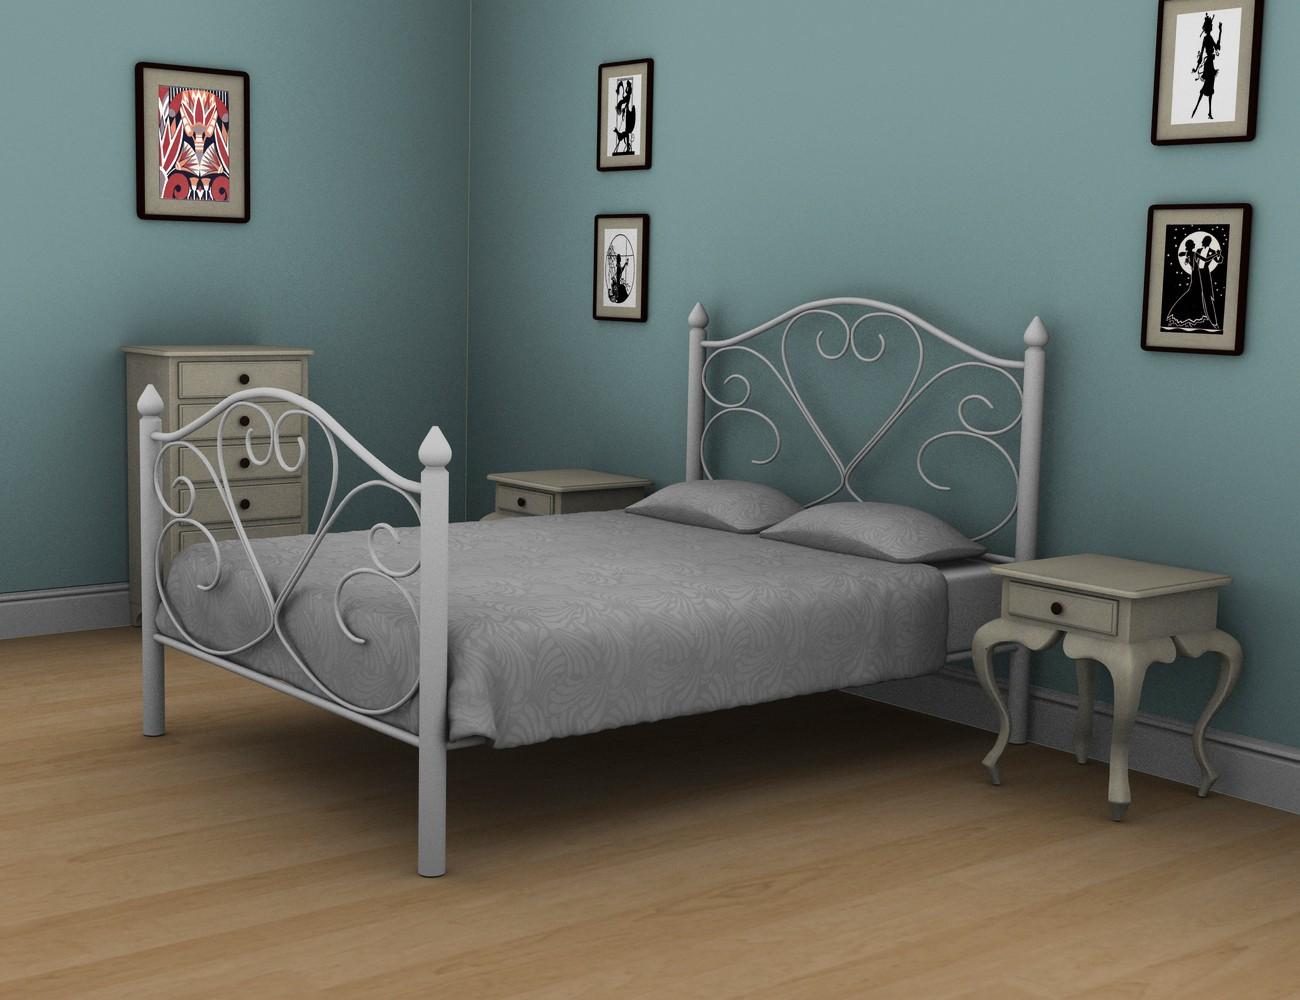 bedroom chair m&s hanging bracket download daz studio 3 for free 3d furniture